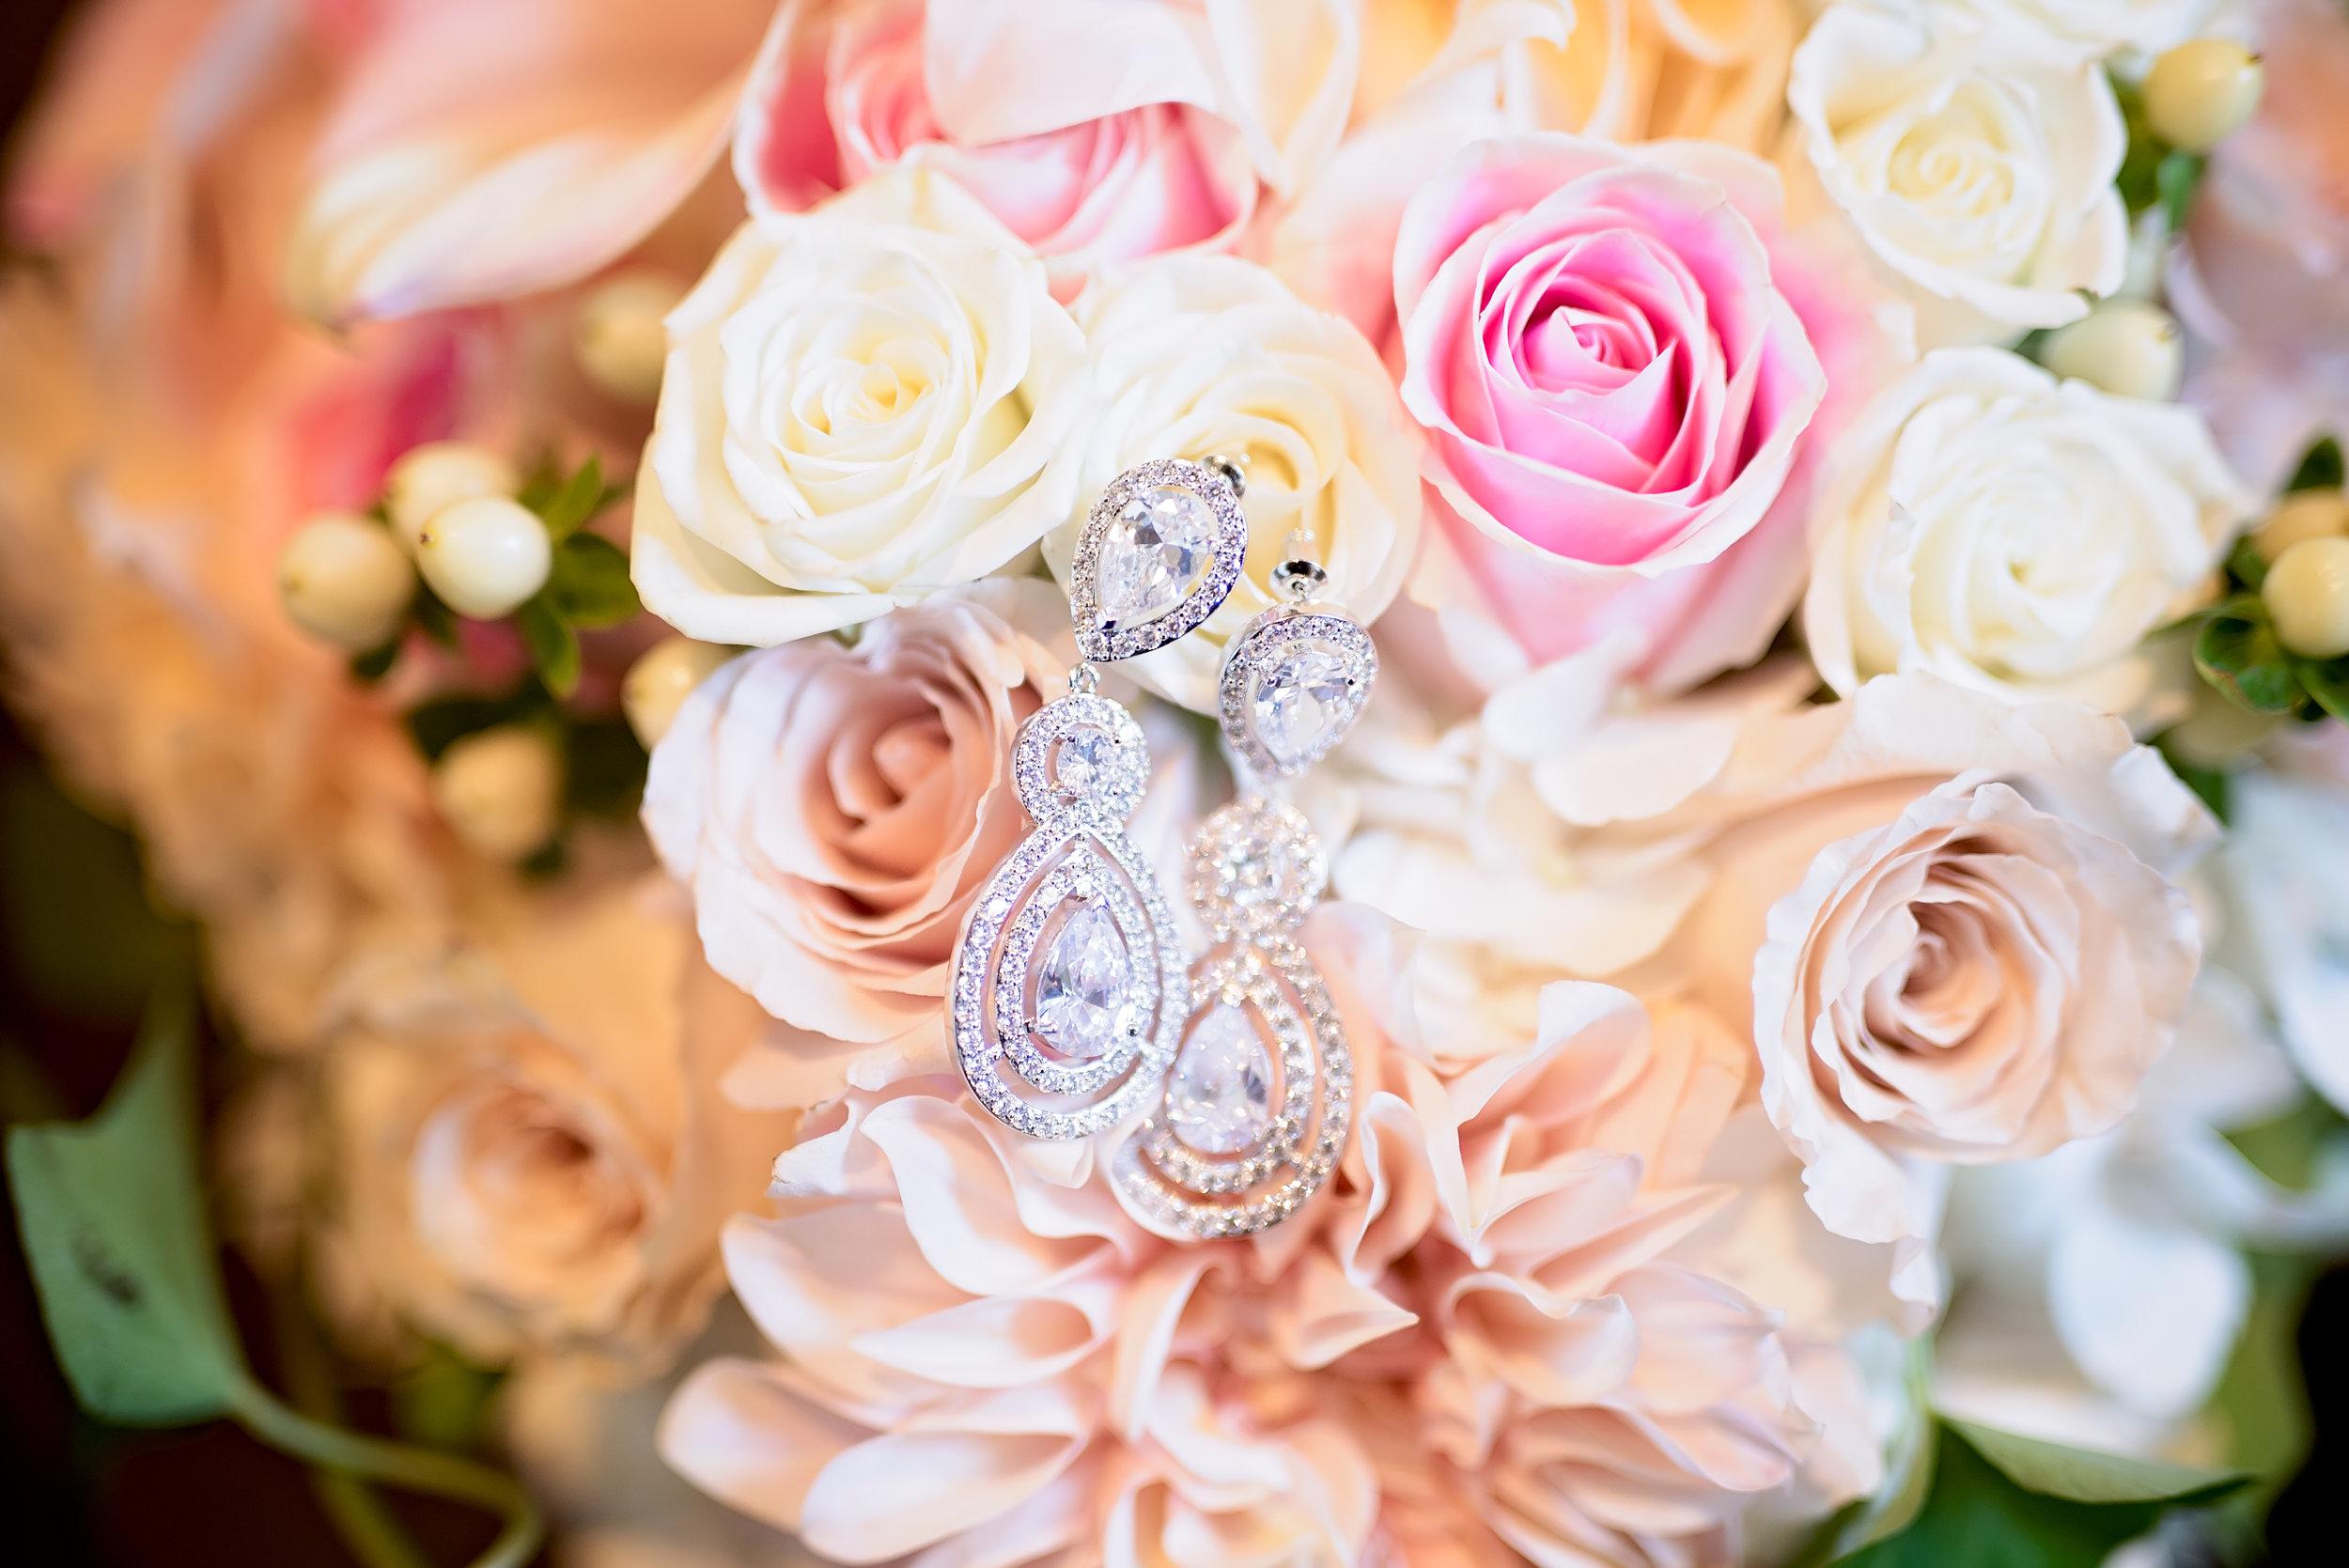 Dallas Wedding- Texas Photographer- Pharris Photography- Carrington and Maxx- Bridal Bouquet